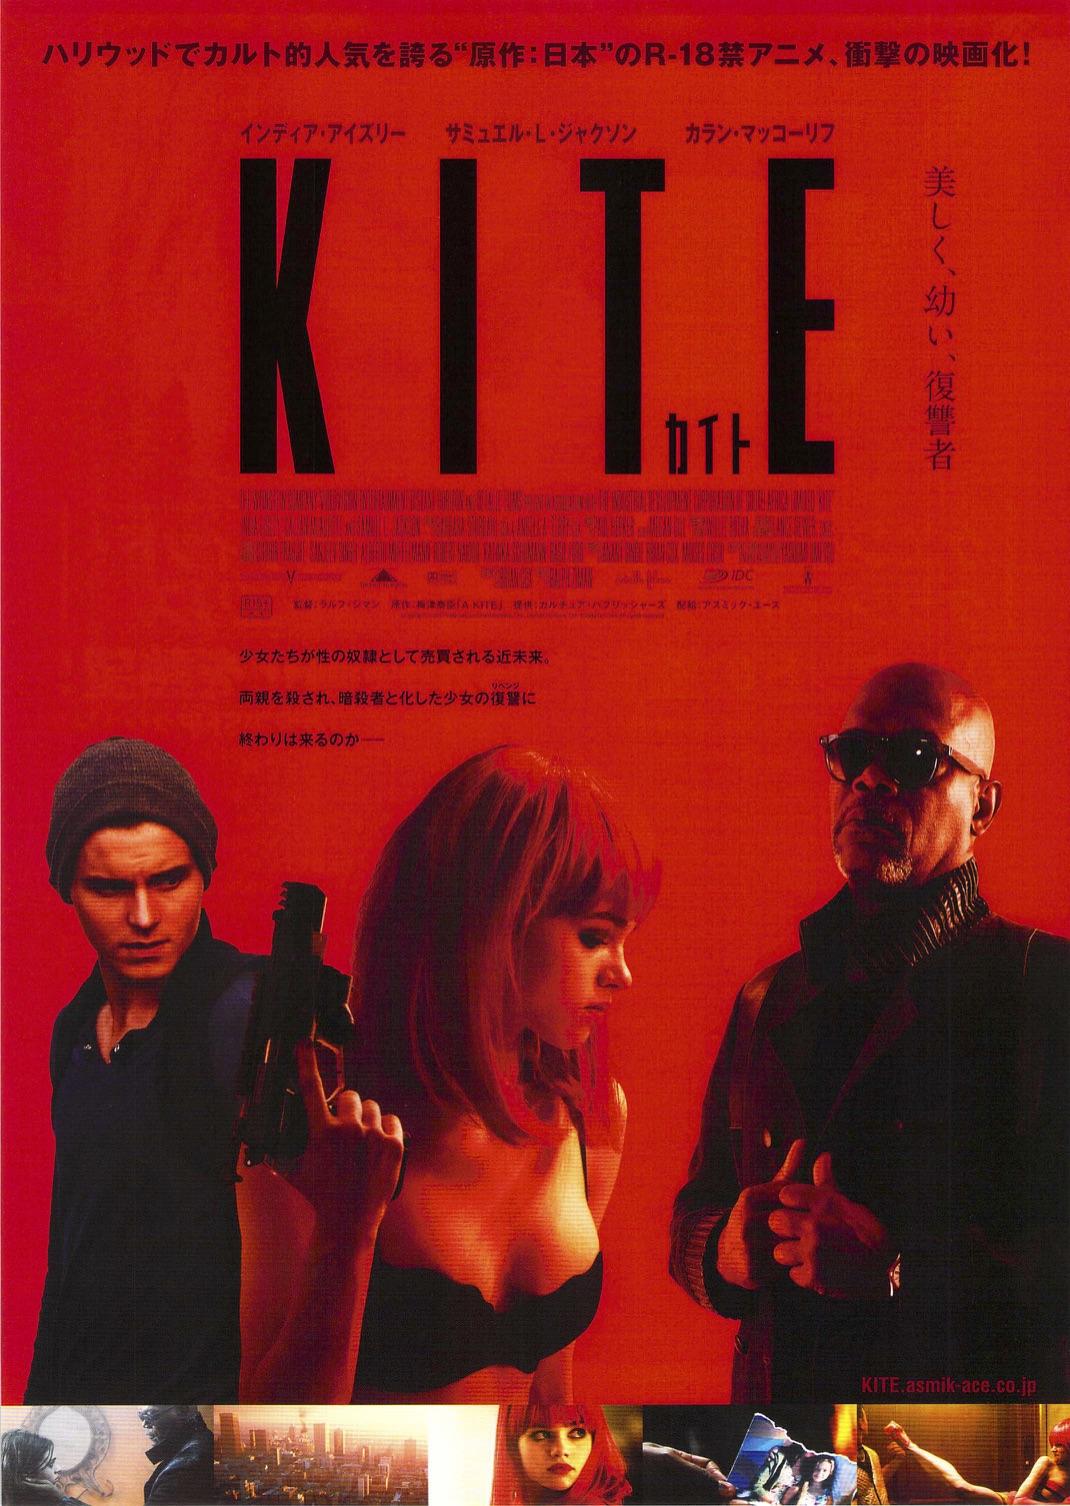 A Kite カイト kite カイト | 映画瓦版